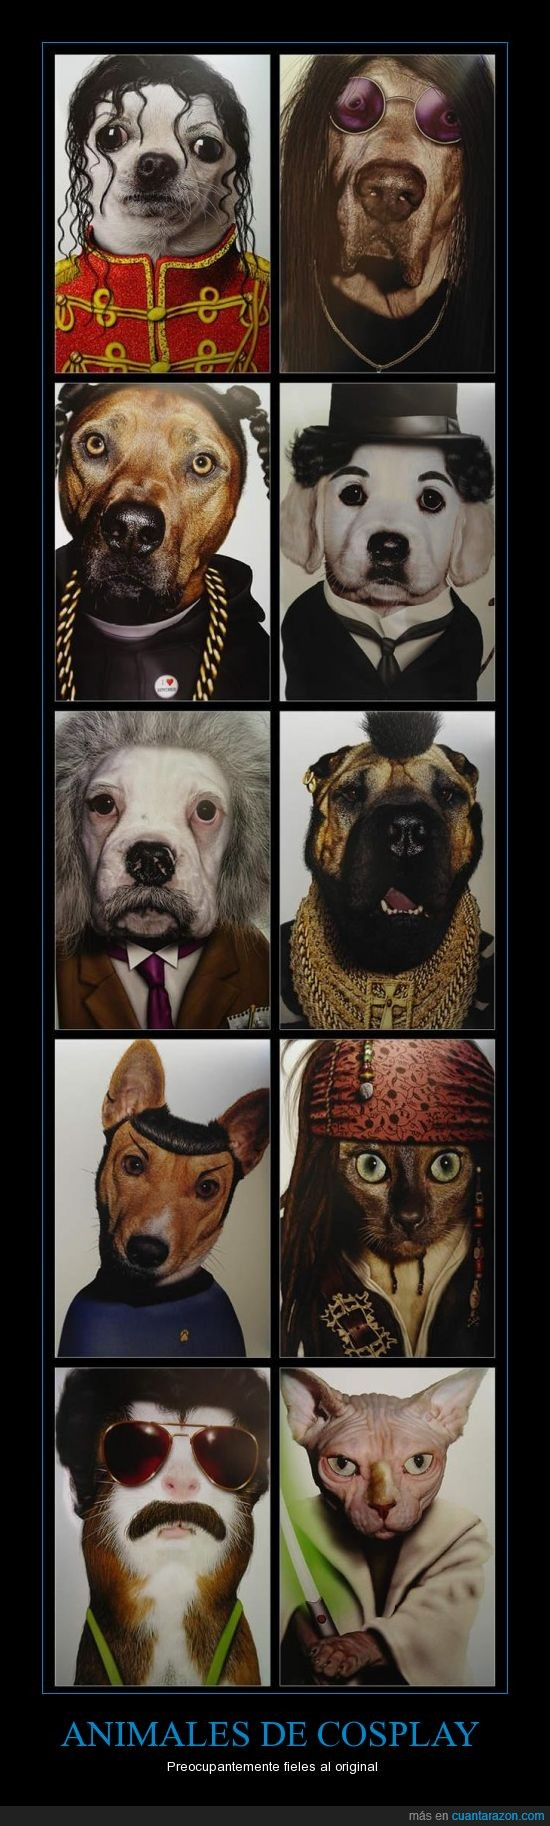 animal,borat,charles chaplin,einstein,famoso,gato,jack sparrow,ma,michael jackson,ozzy,perro,snoop dog,spock,yoda